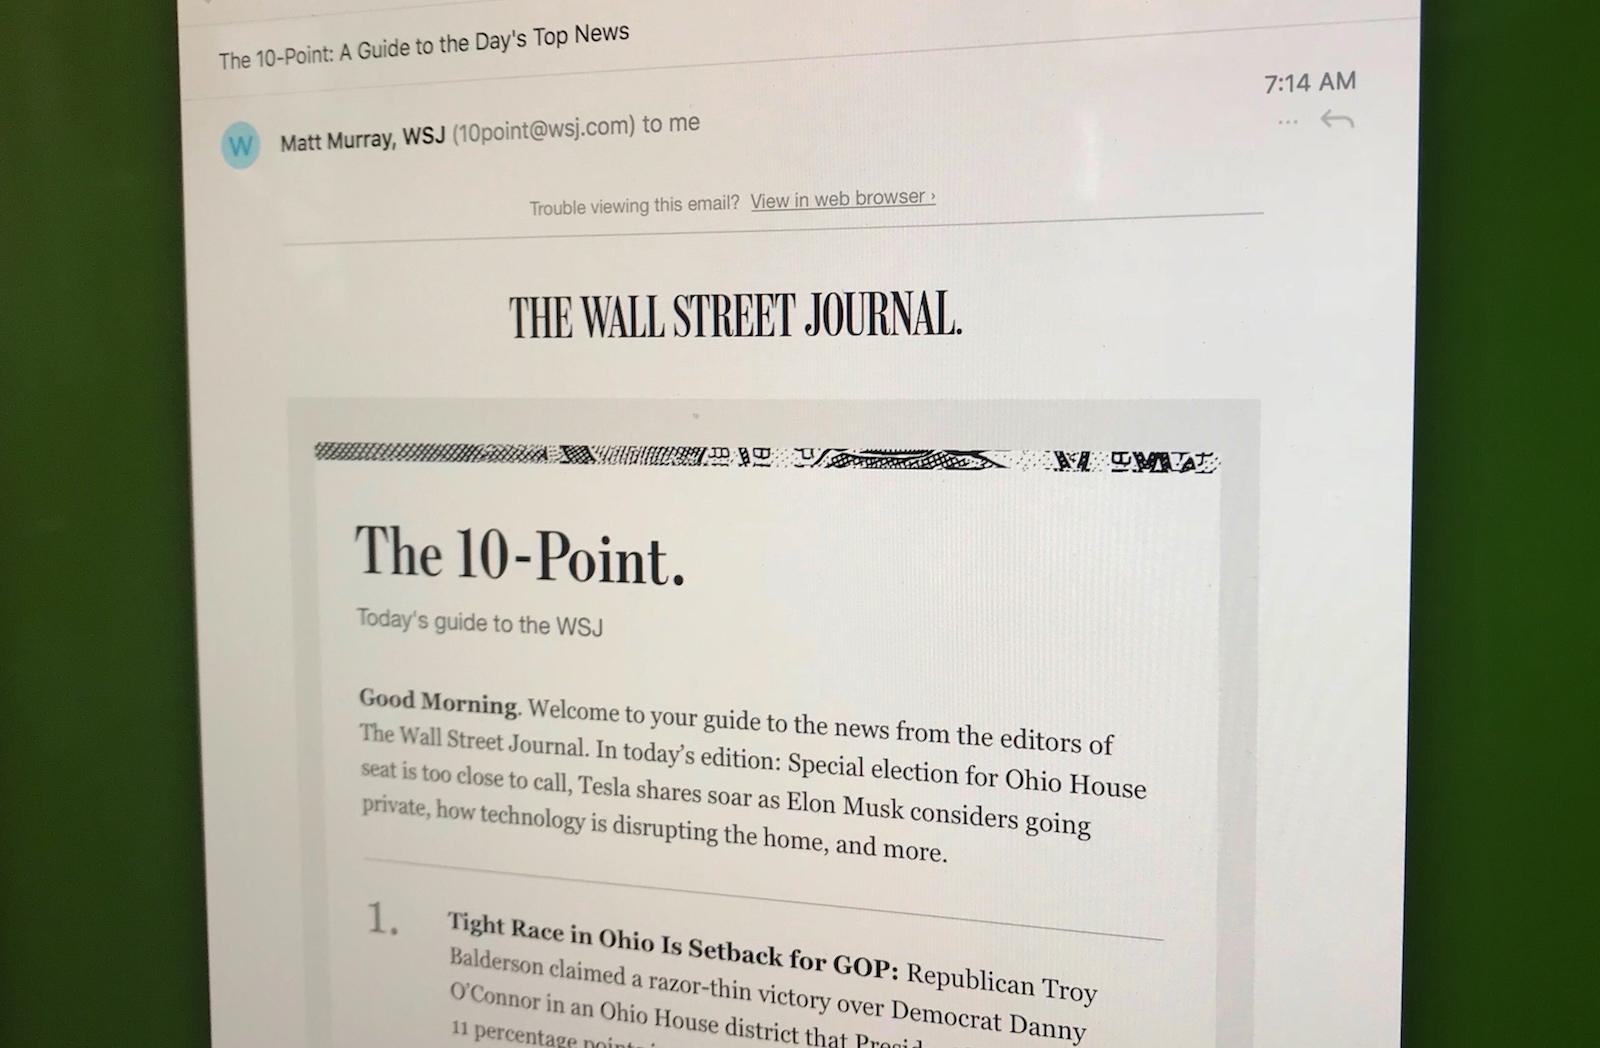 WSJ이 주는 뉴스레터 팁 5가지 - 월스트리트저널은...